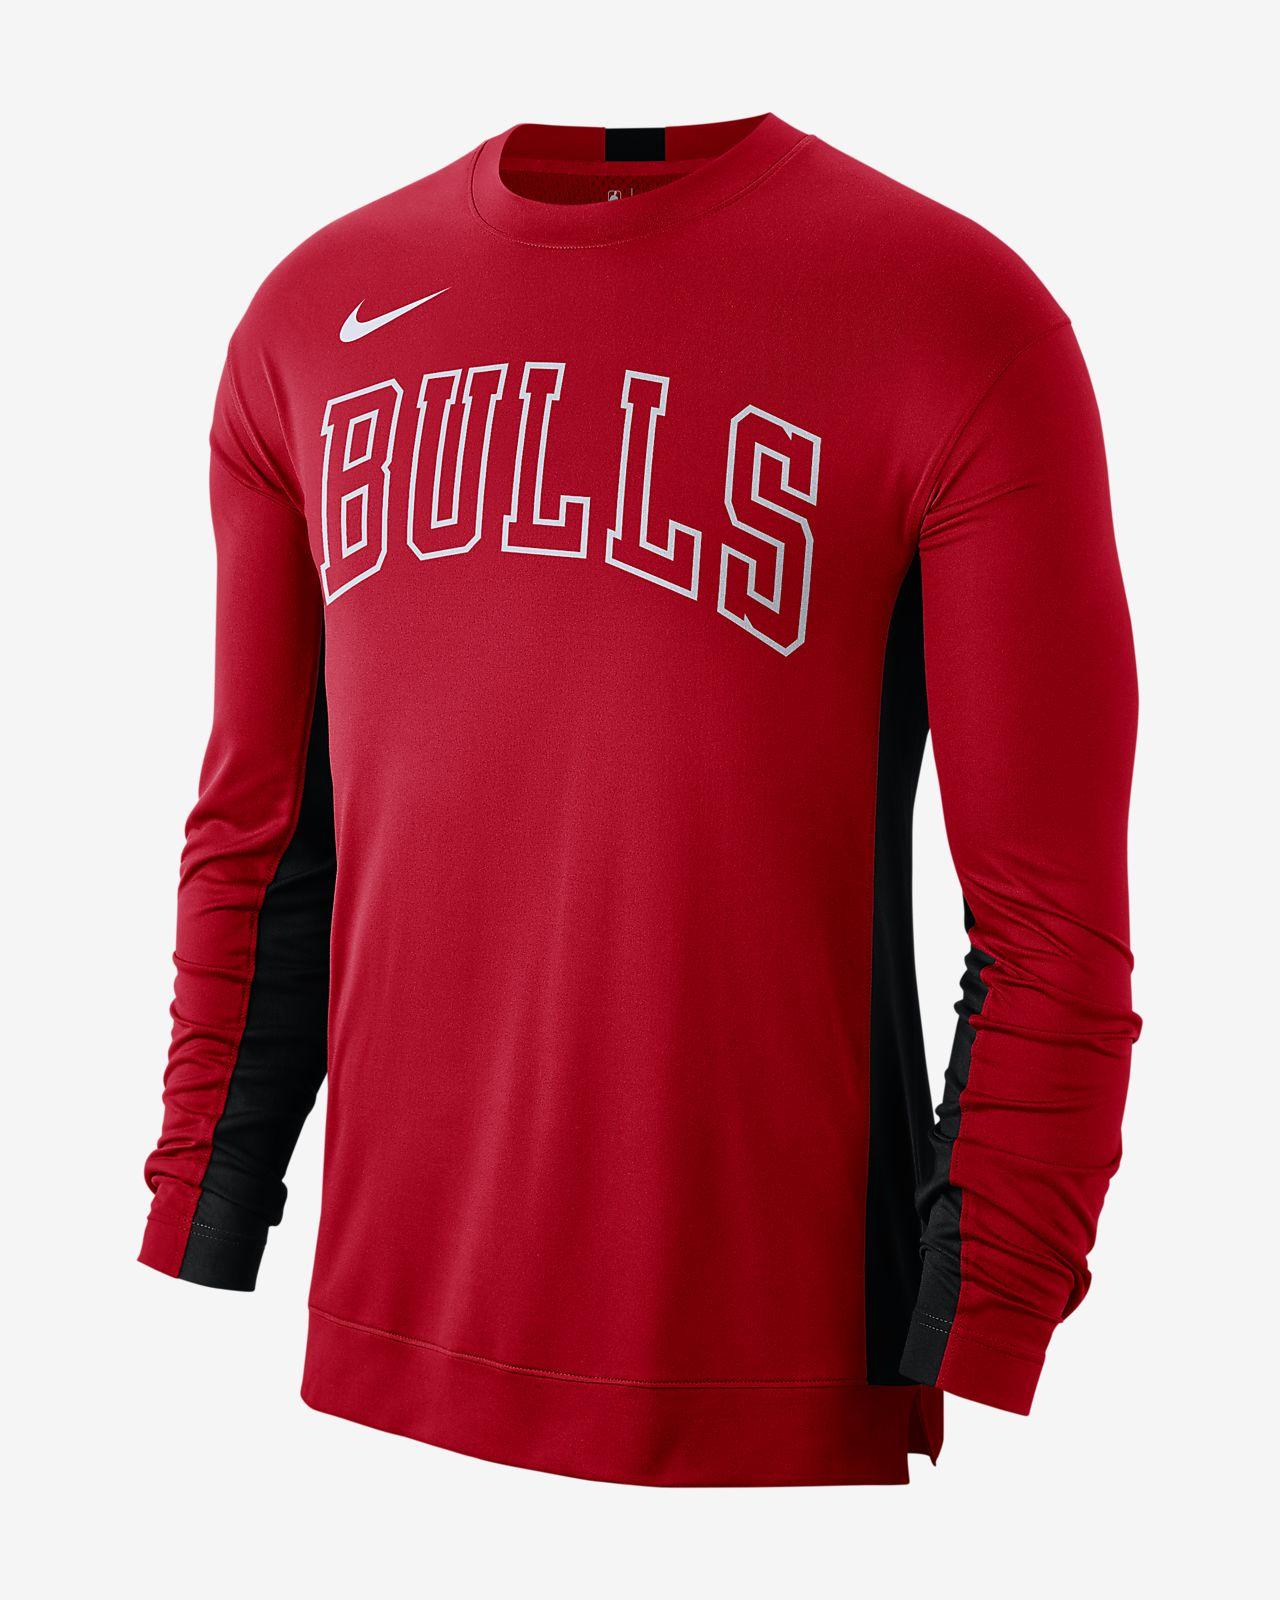 Chicago Bulls Nike Dri-FIT NBA-Shooting-Shirt für Herren